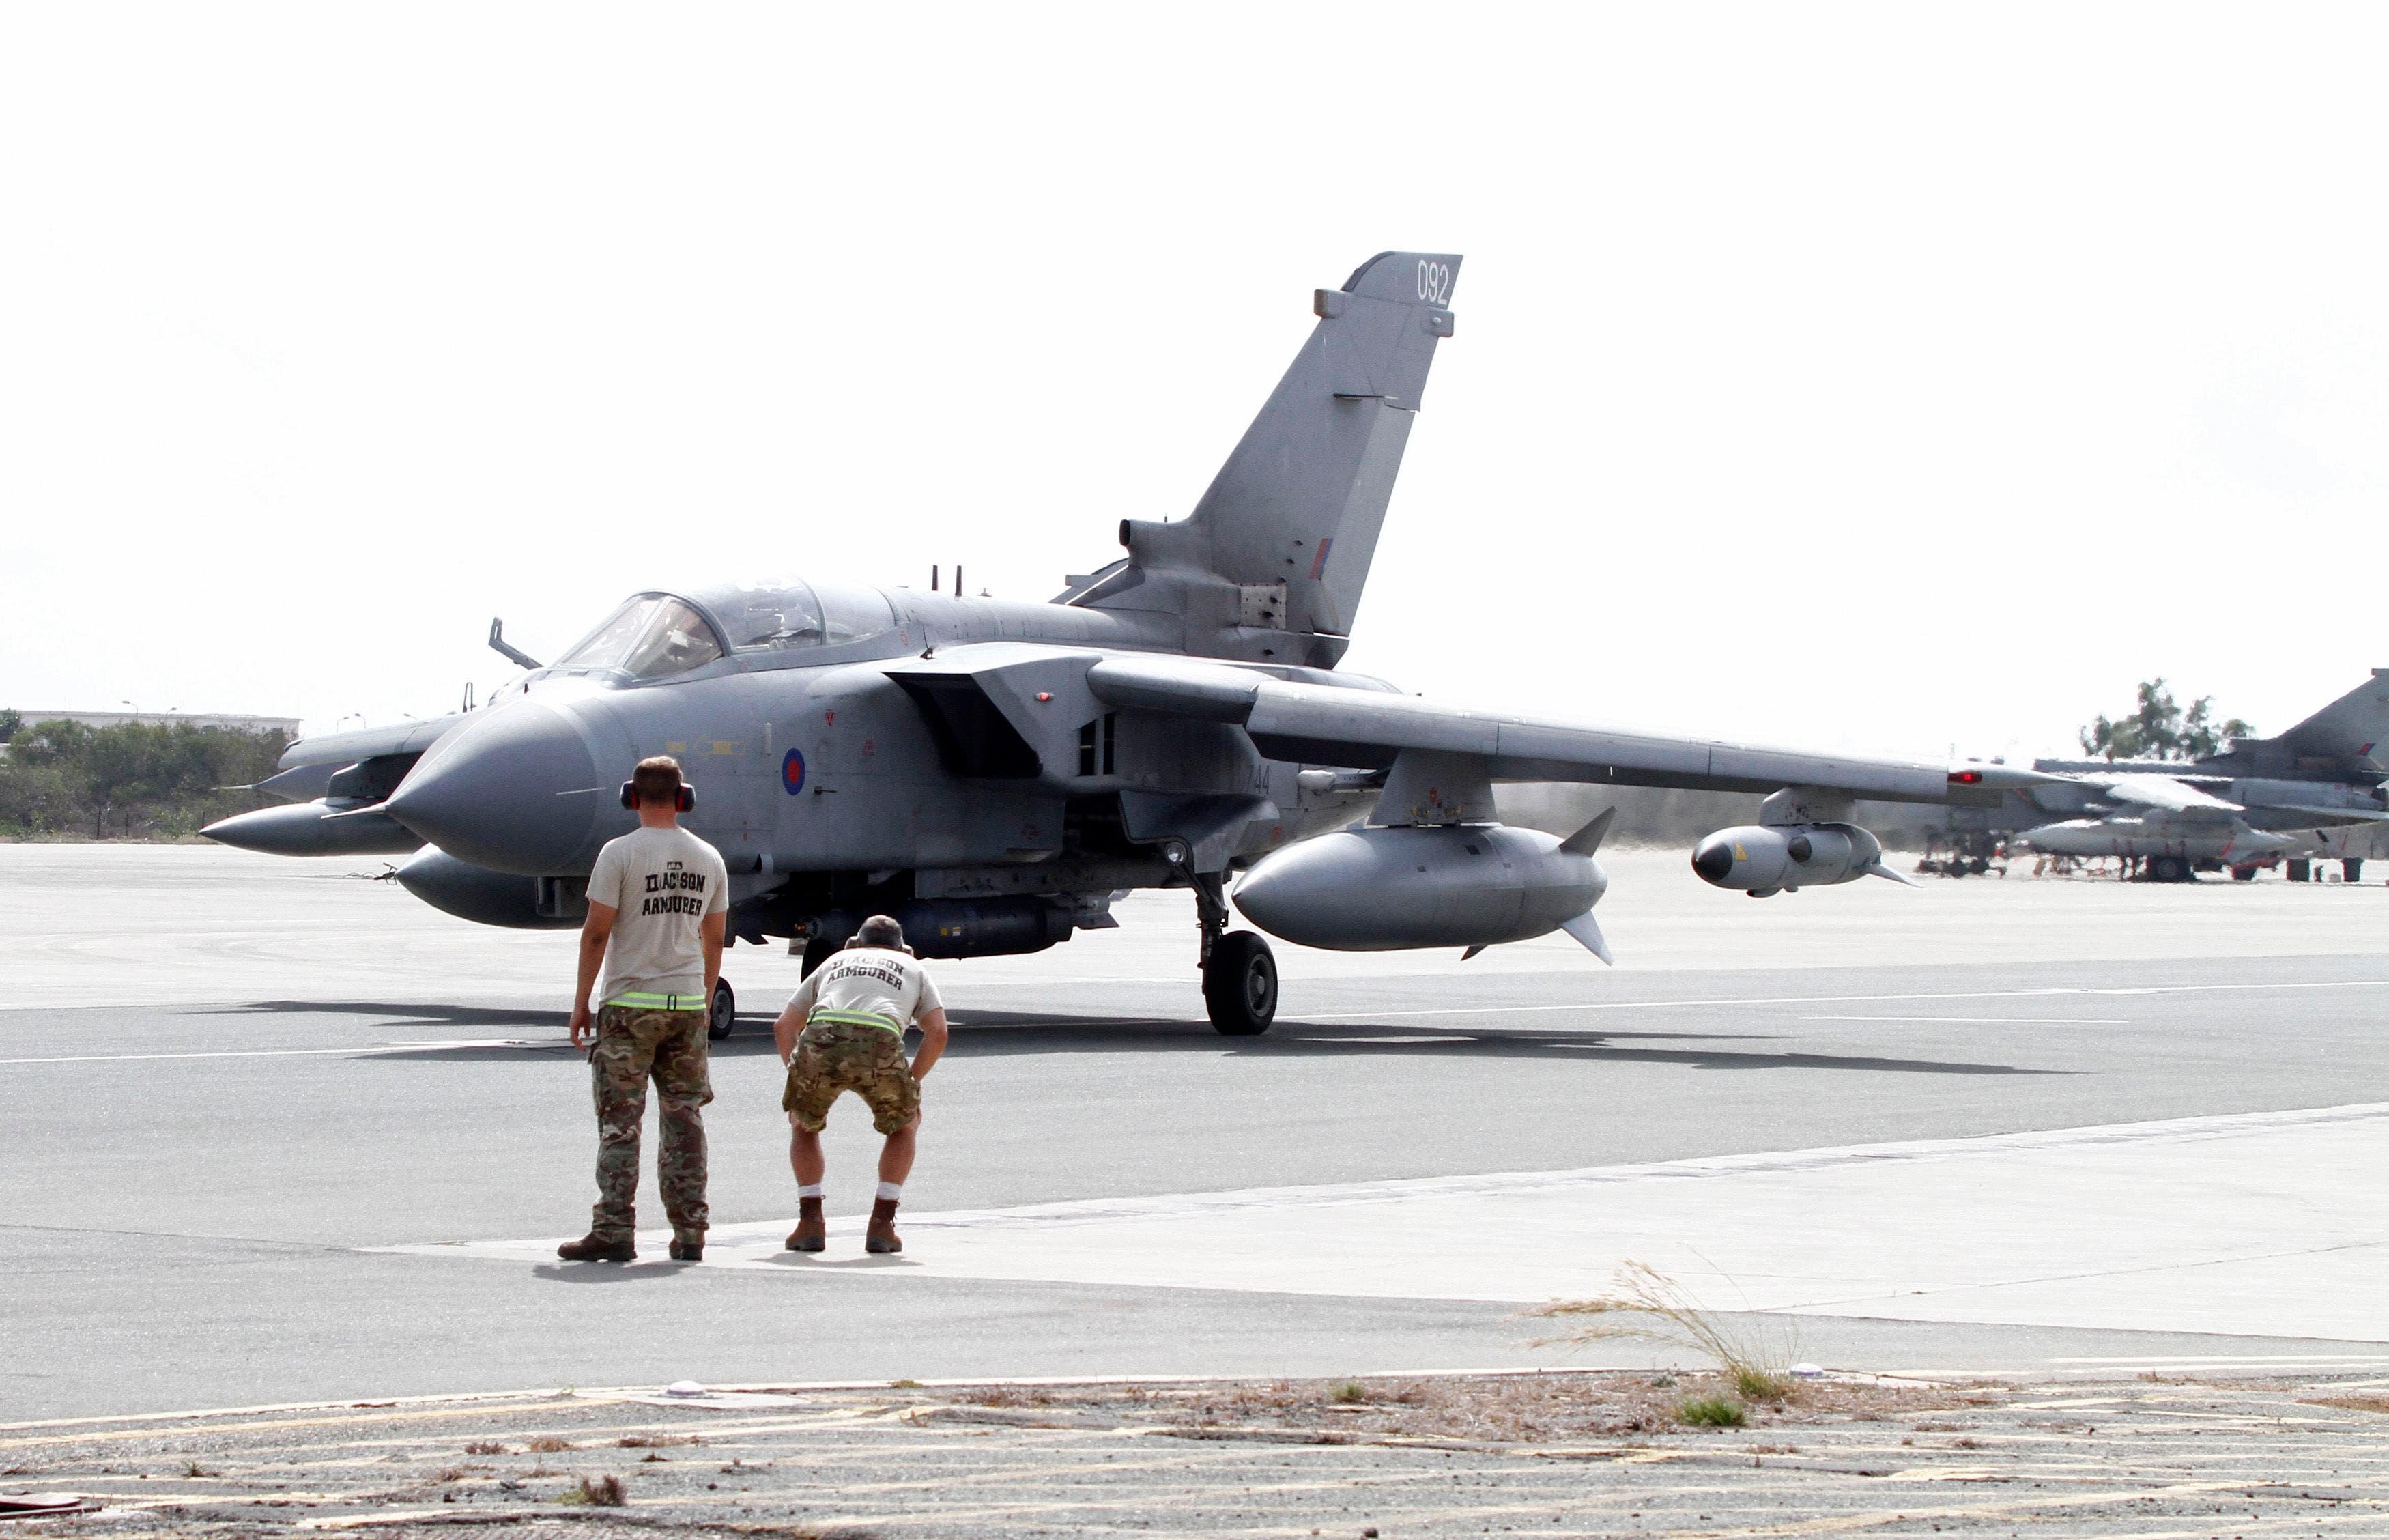 A British tornado jet prepares for takeoff at RAF Akrotiri in Cyprus September 27, 2014. (Reuters)